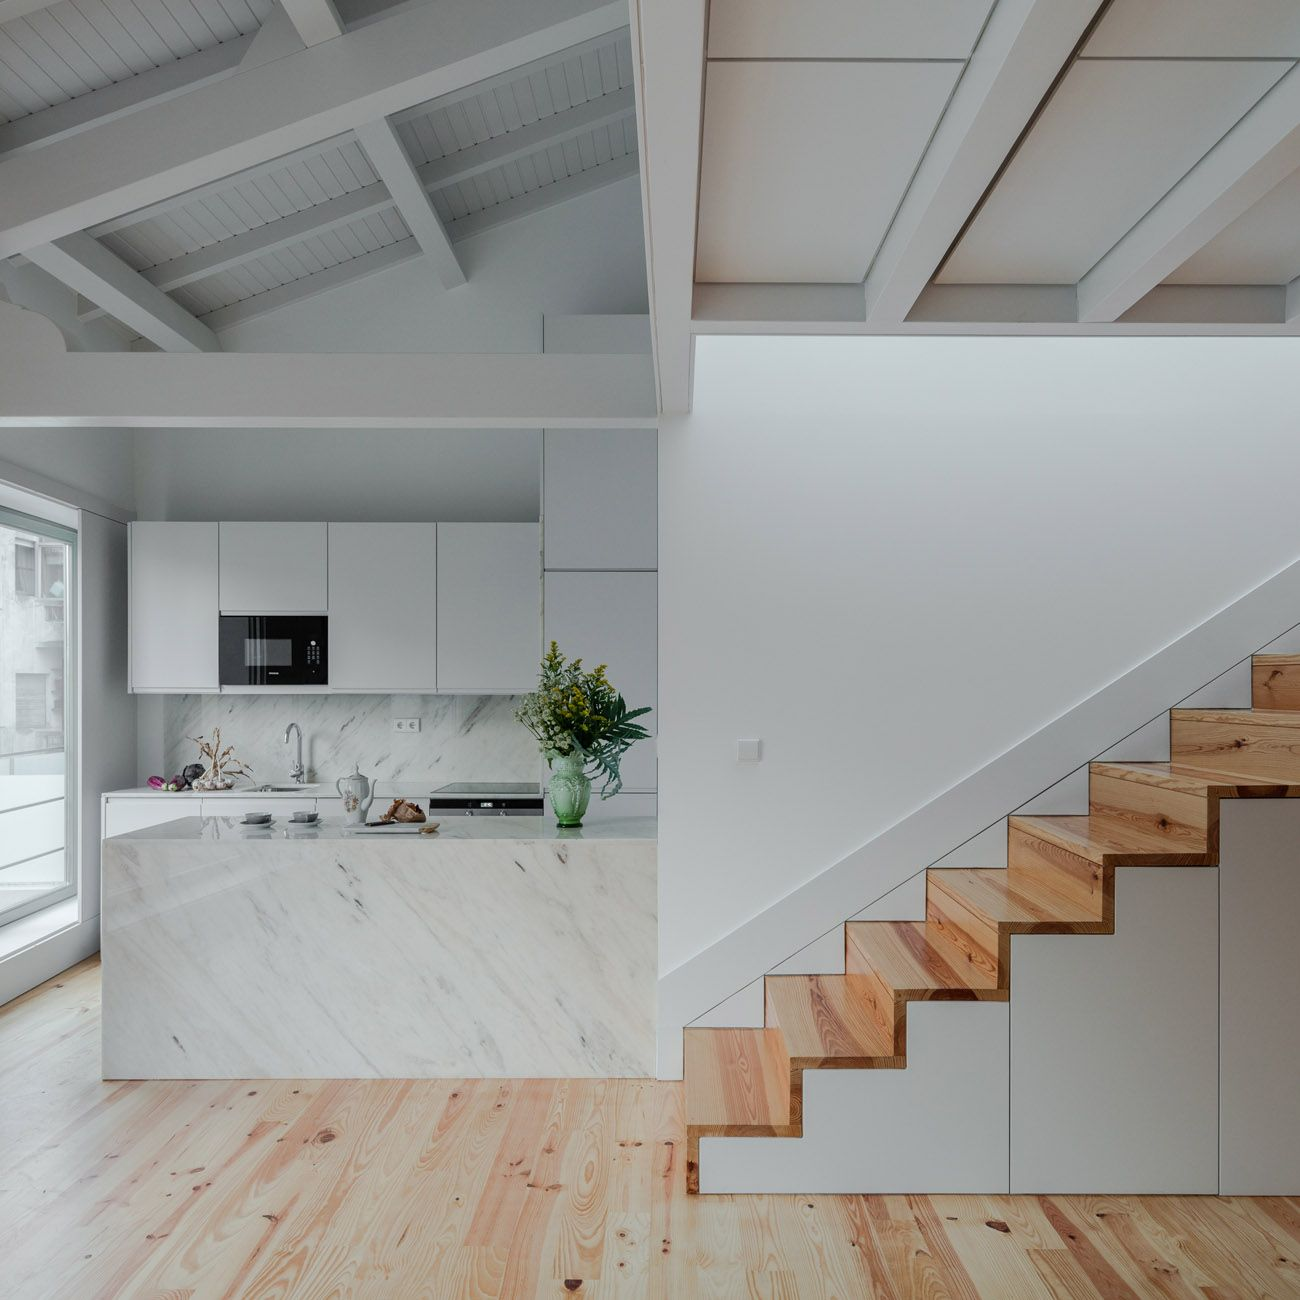 Pedro Ferreira Architecture Studio Gives New Life To A 19th Century House In Porto